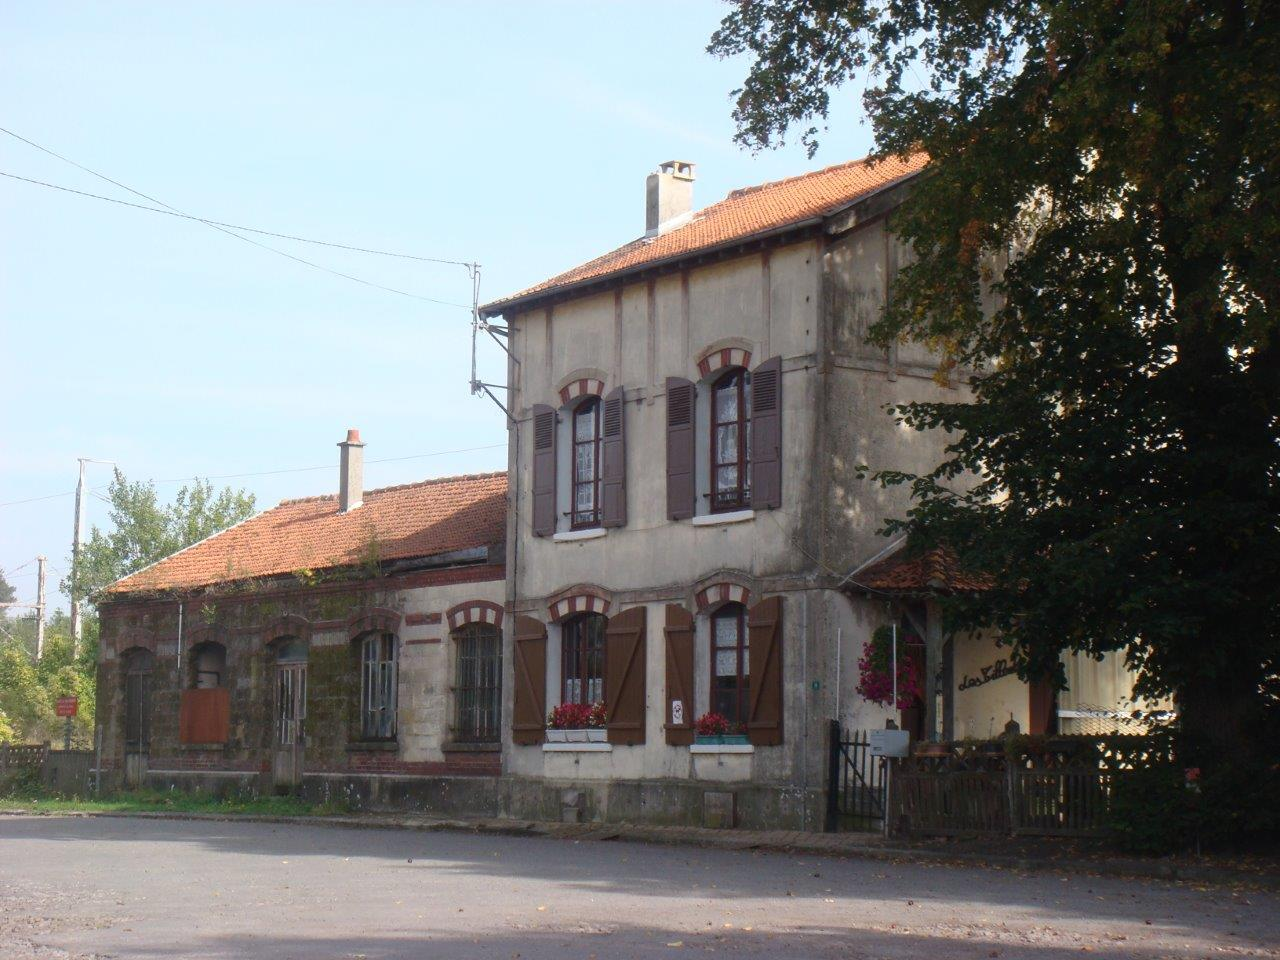 gare-de-miraumont-train-station